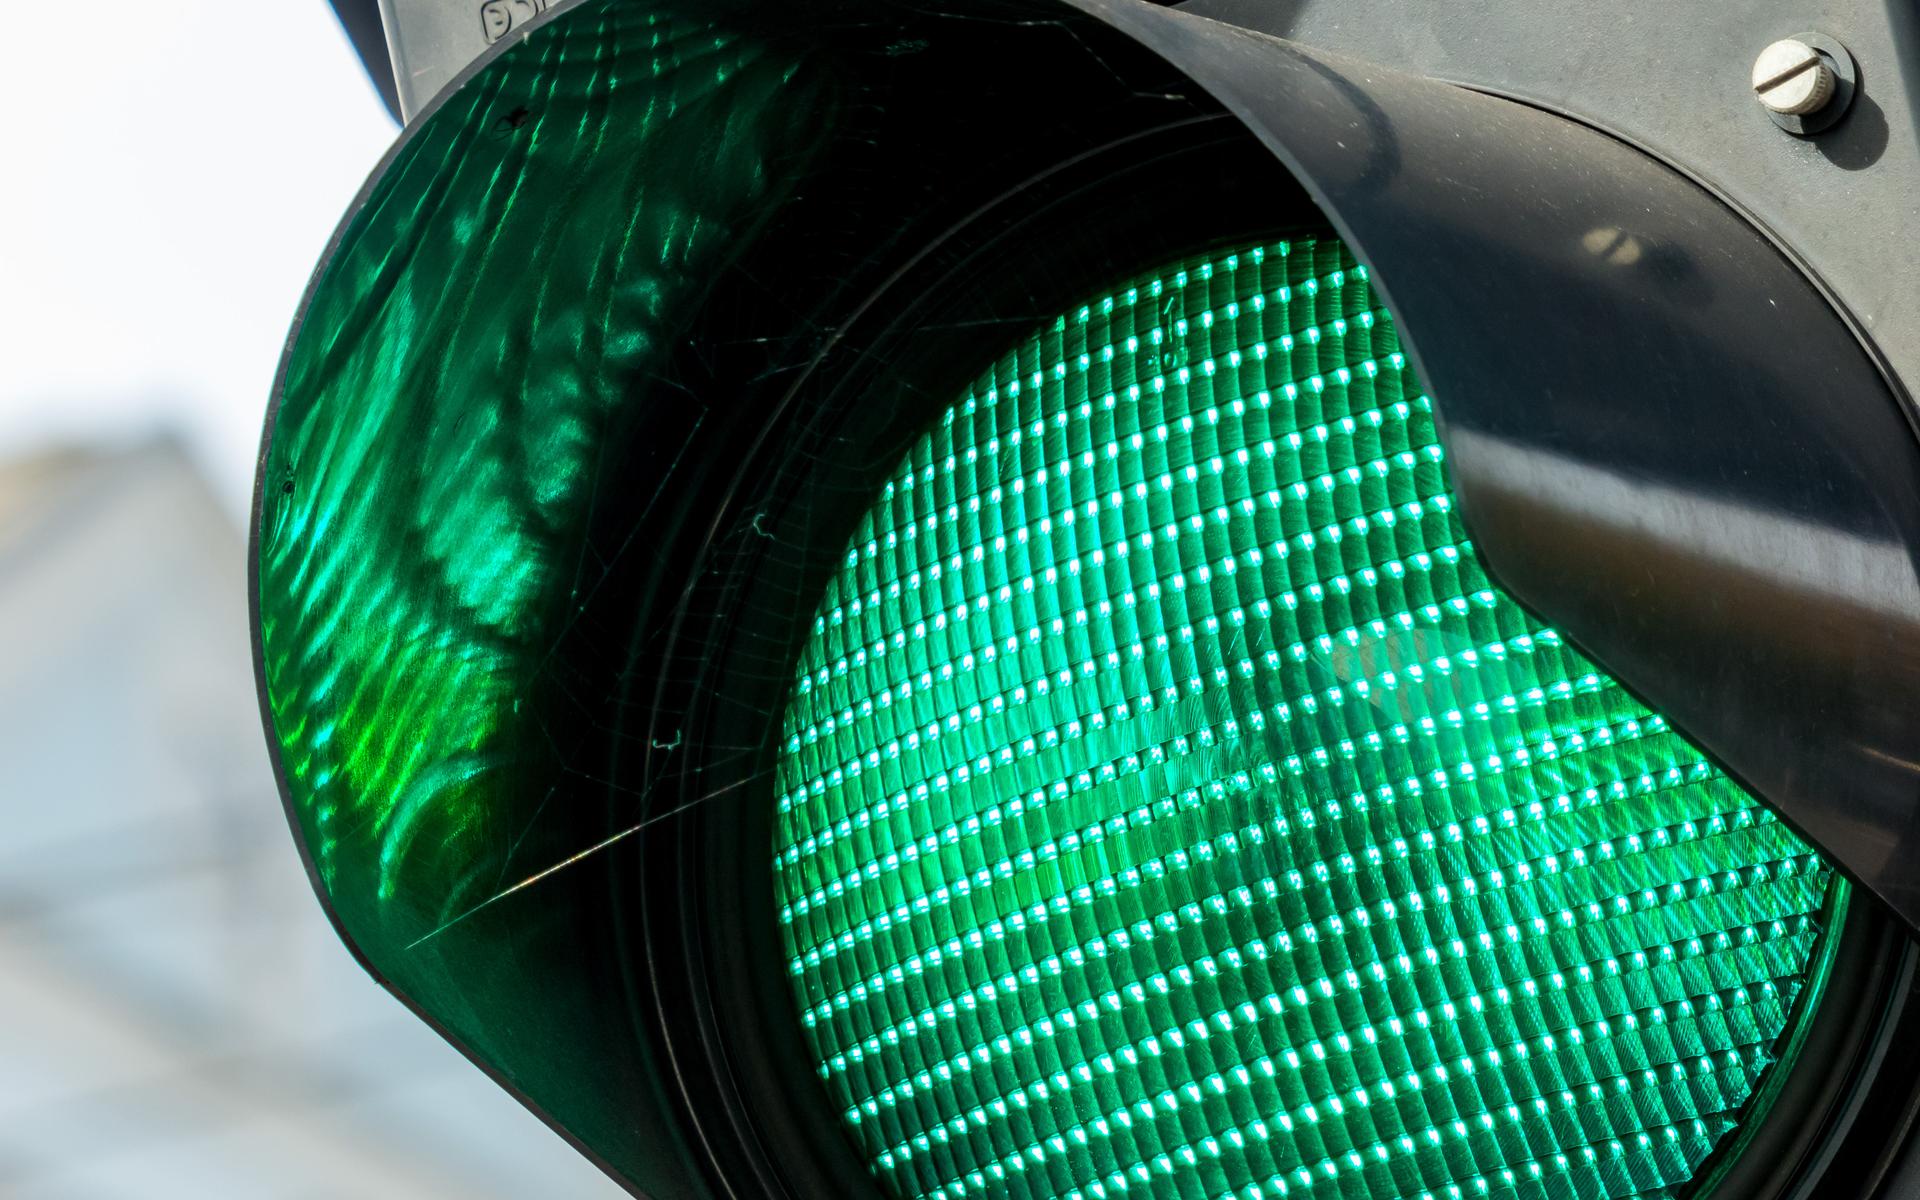 bitcoin price indicator turned green